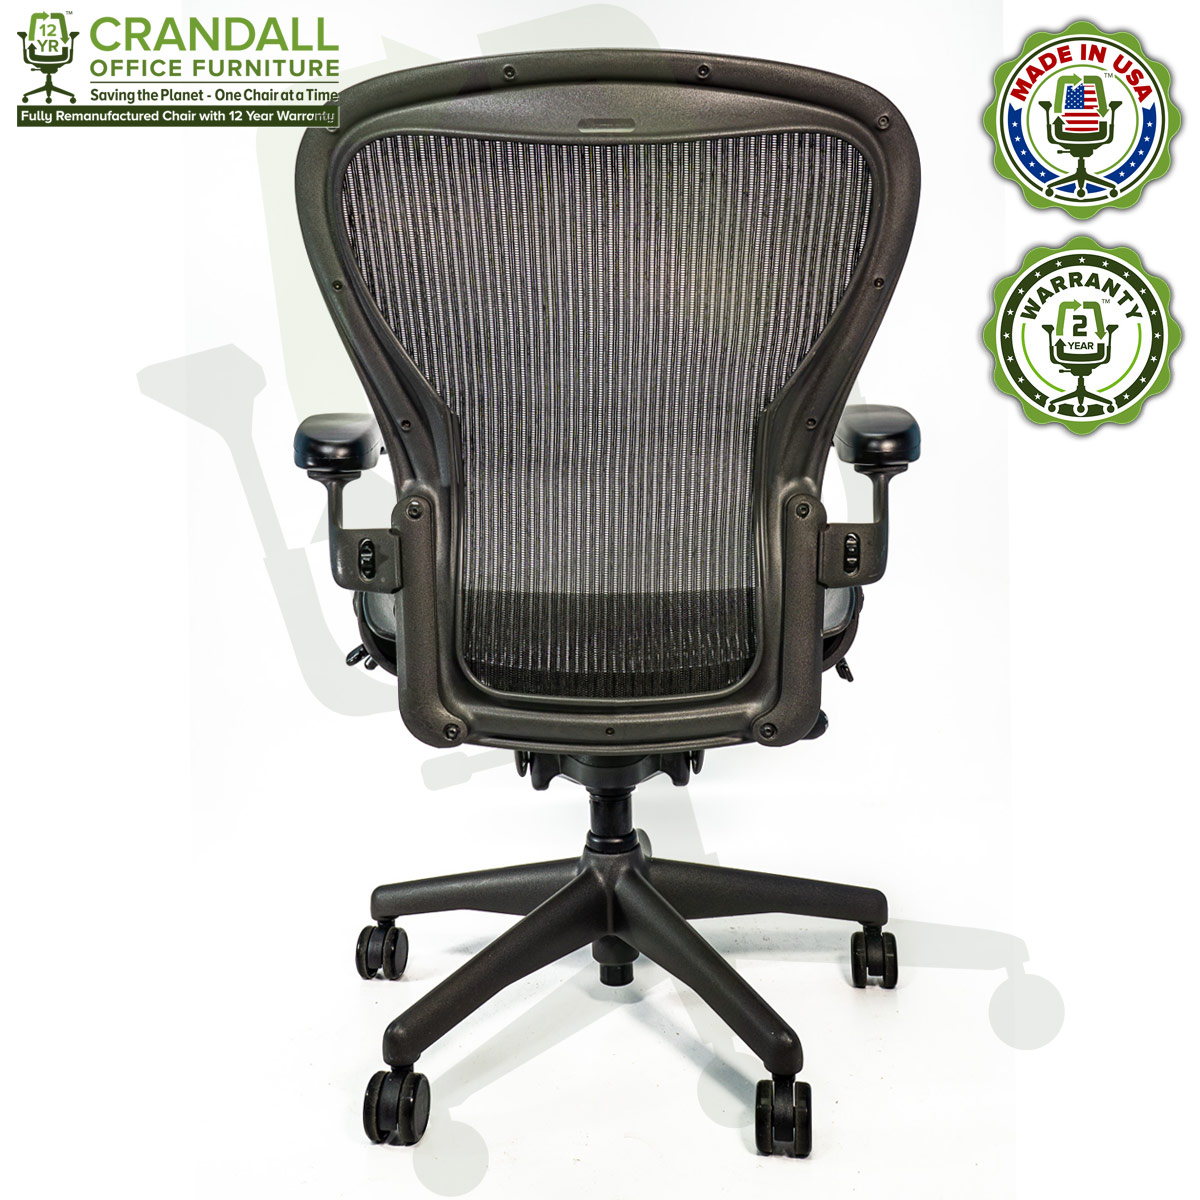 Crandall Office Refurbished Herman Miller Aeron Chair - Size C - 0005